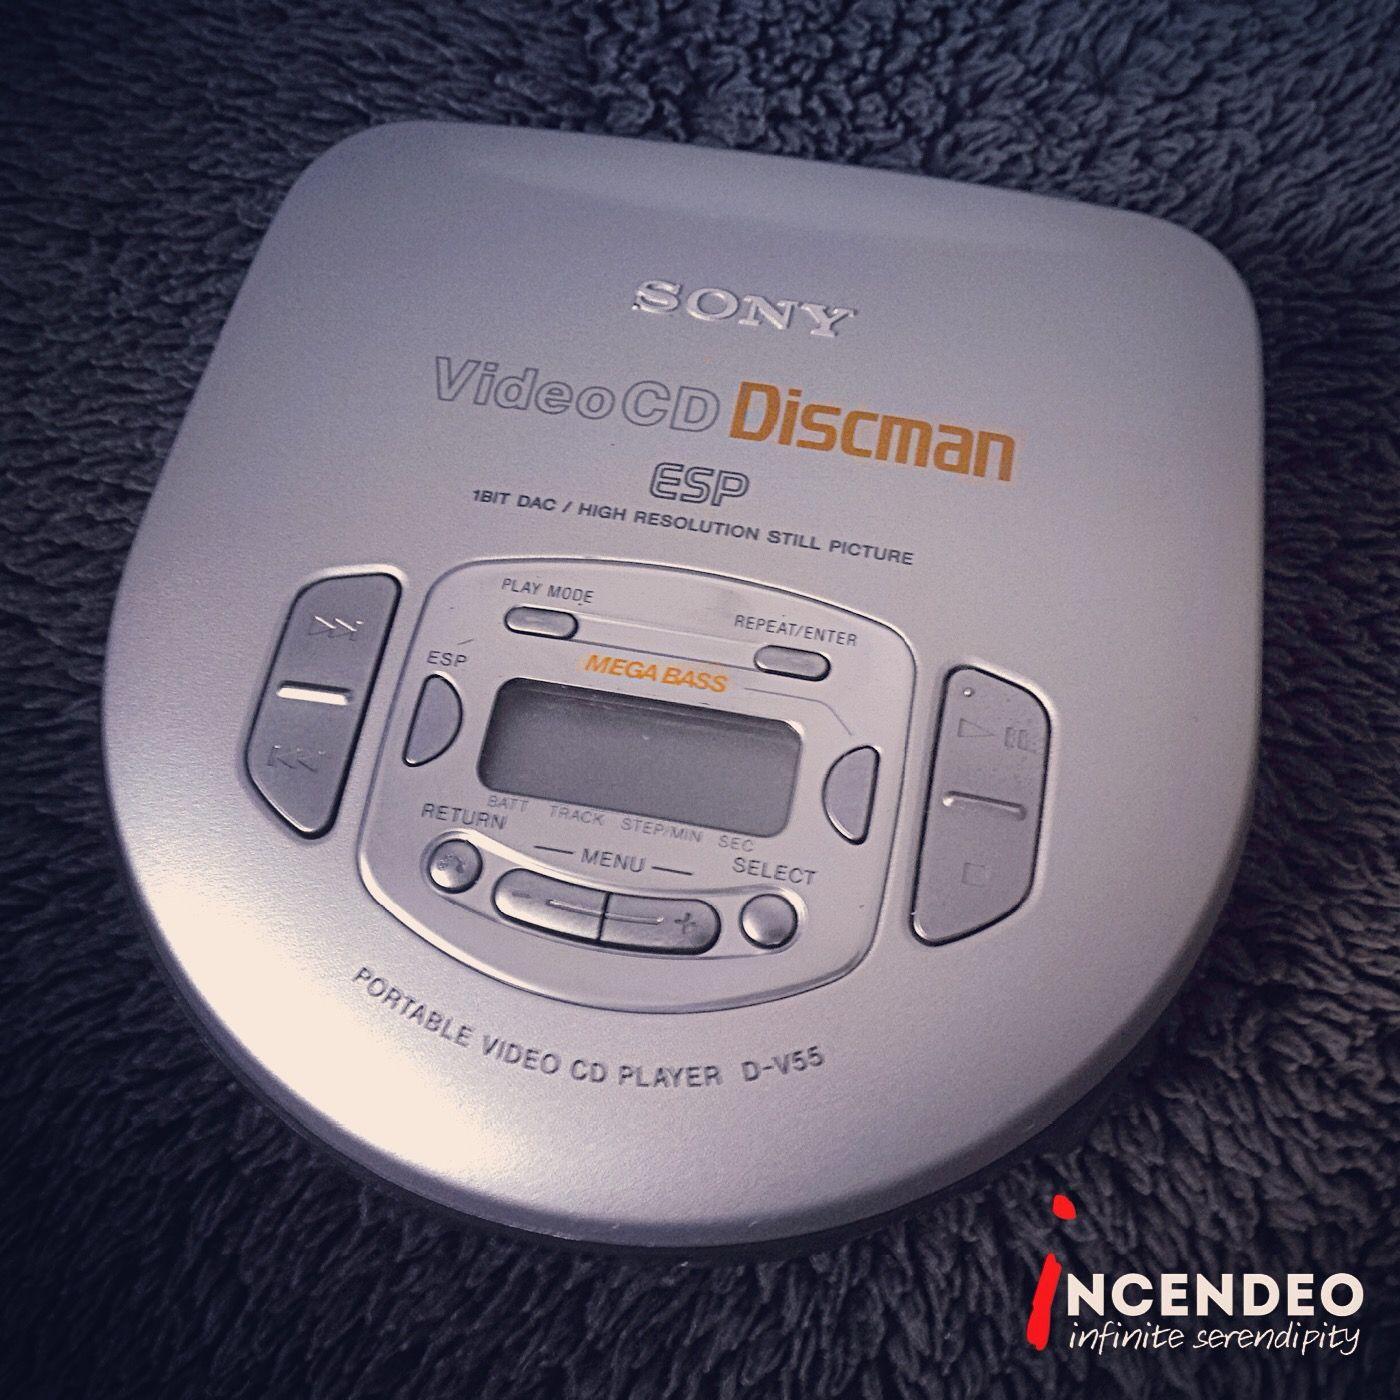 e129cbf26fba Sony VideoCD Discman CD Player D-V55.  sony  discman  walkman  cd ...